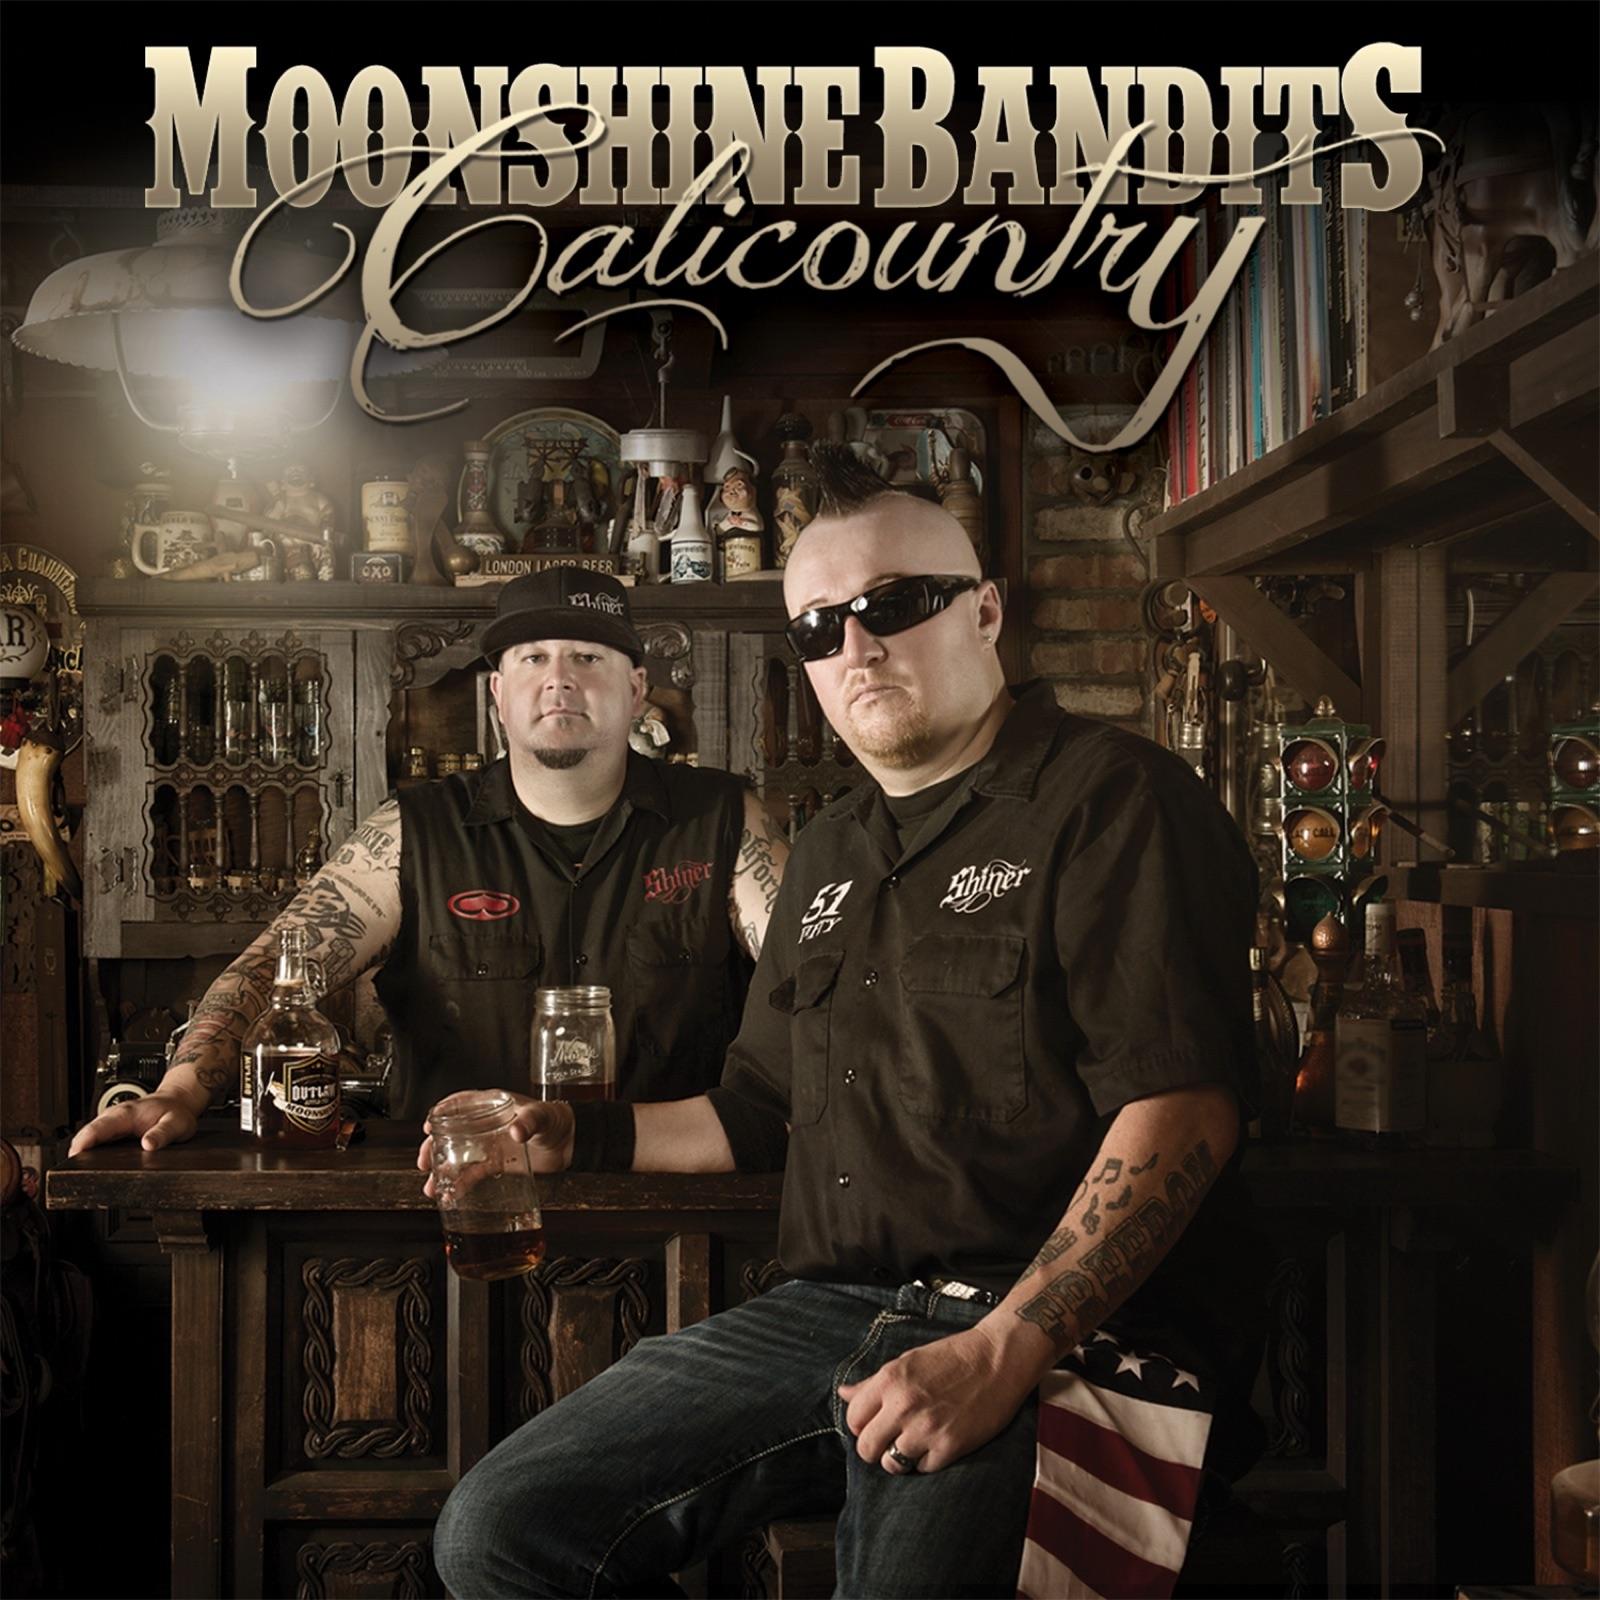 moonshine bandits big b - photo #20